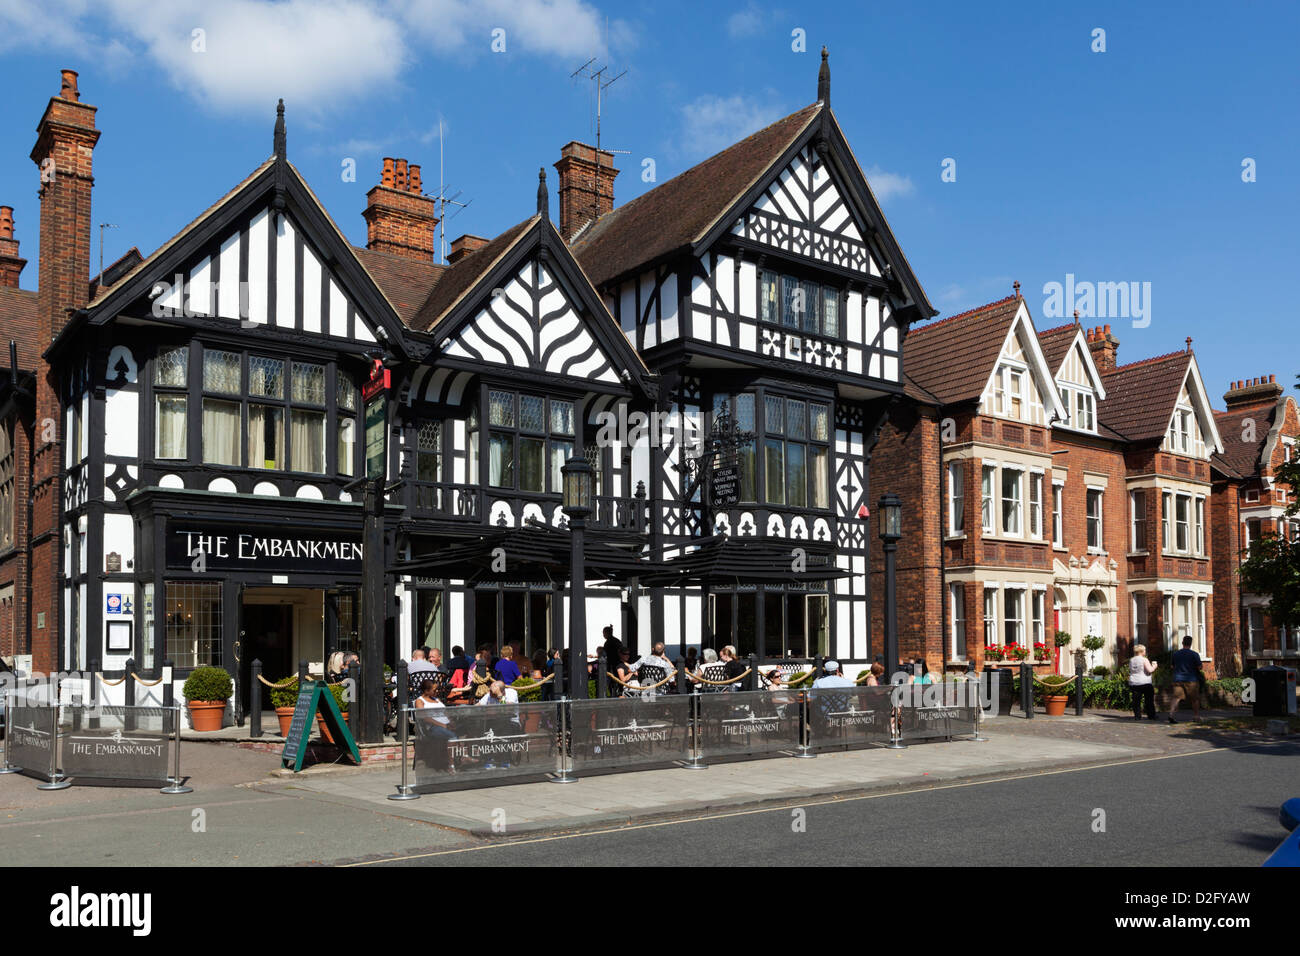 The Embankment pub - Stock Image